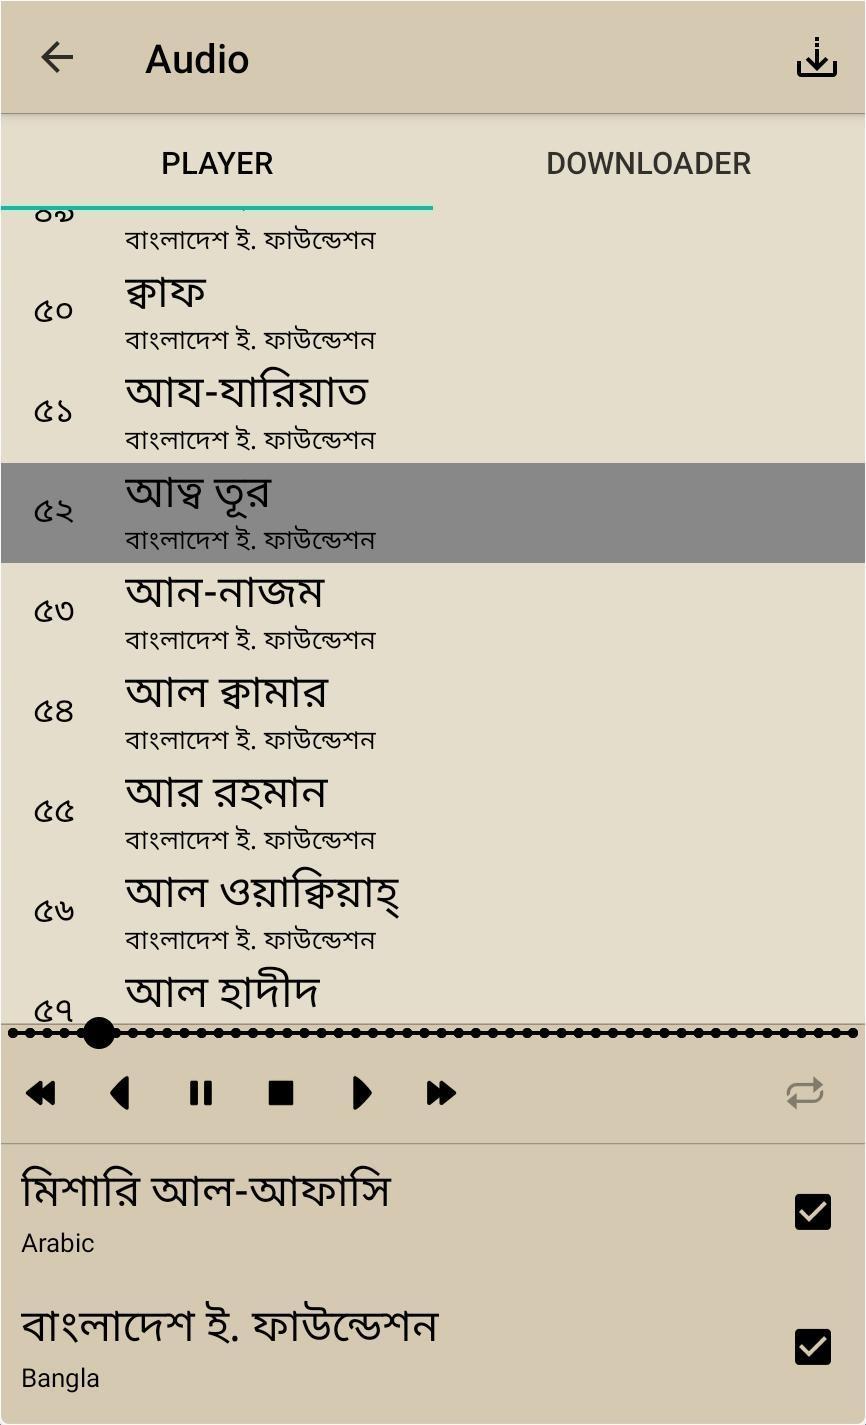 Bangla Quran -উচ্চারণসহ (কুরআন মাজিদ) for